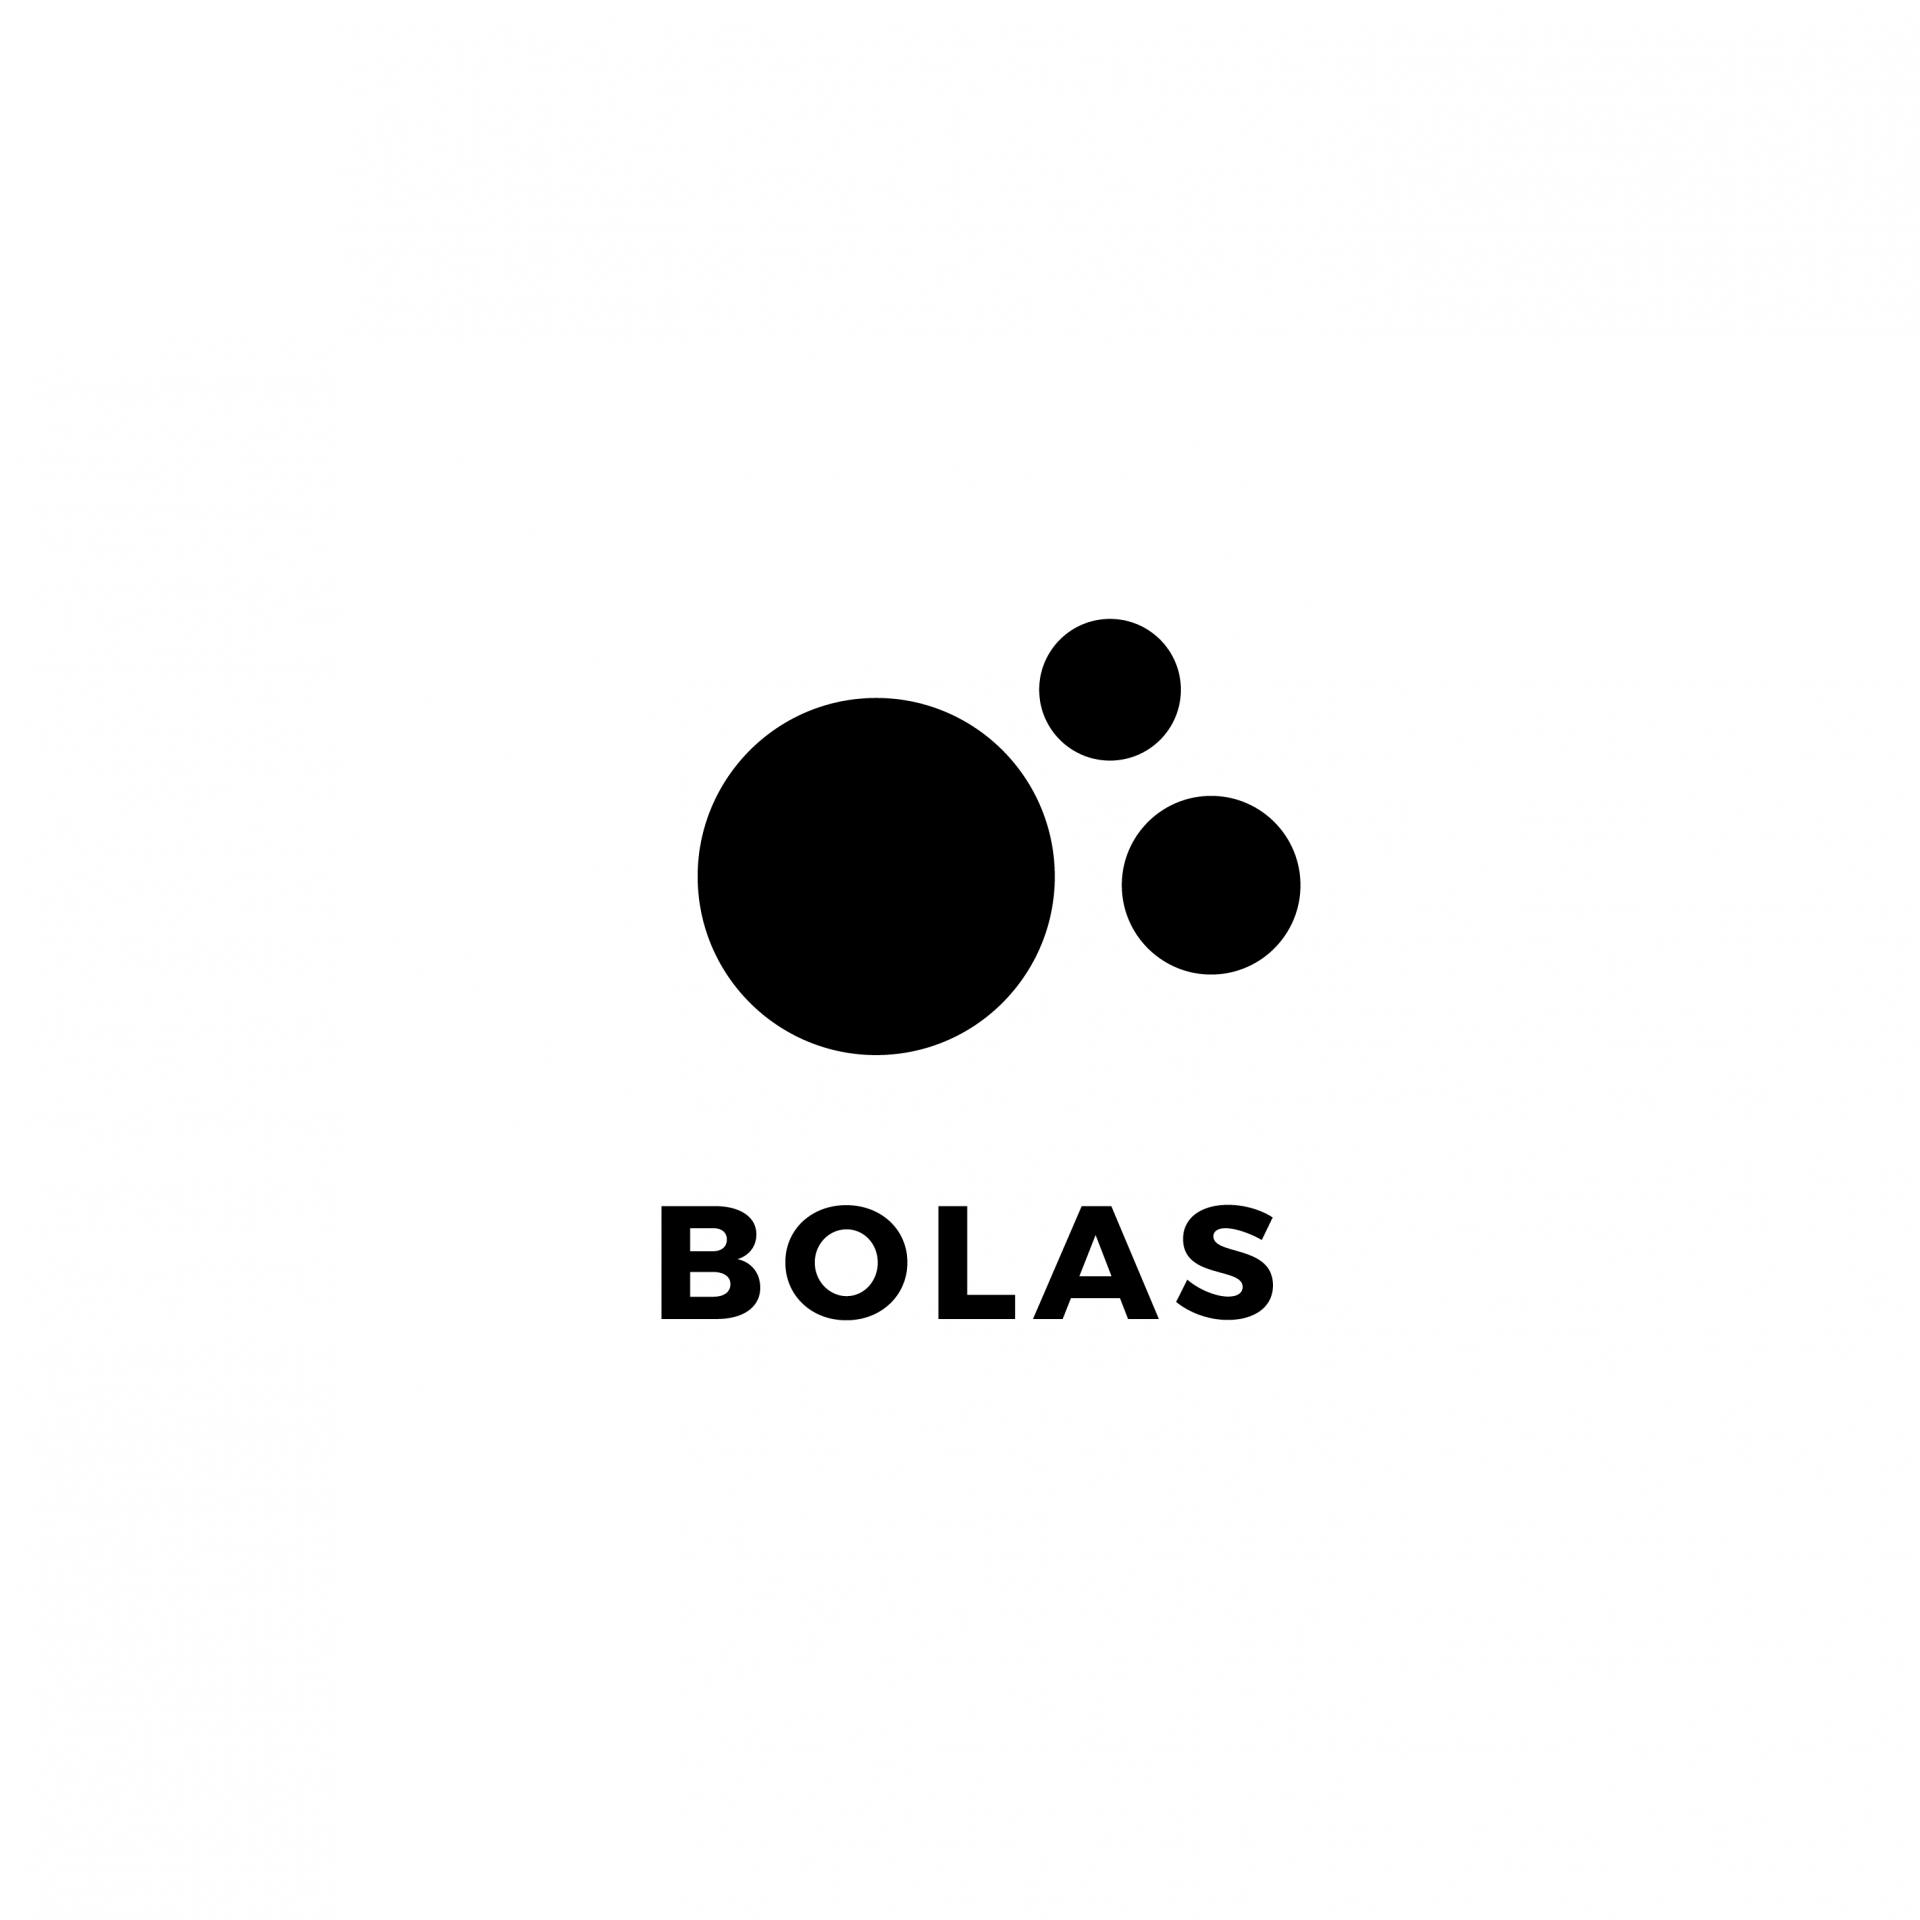 Bolas 02